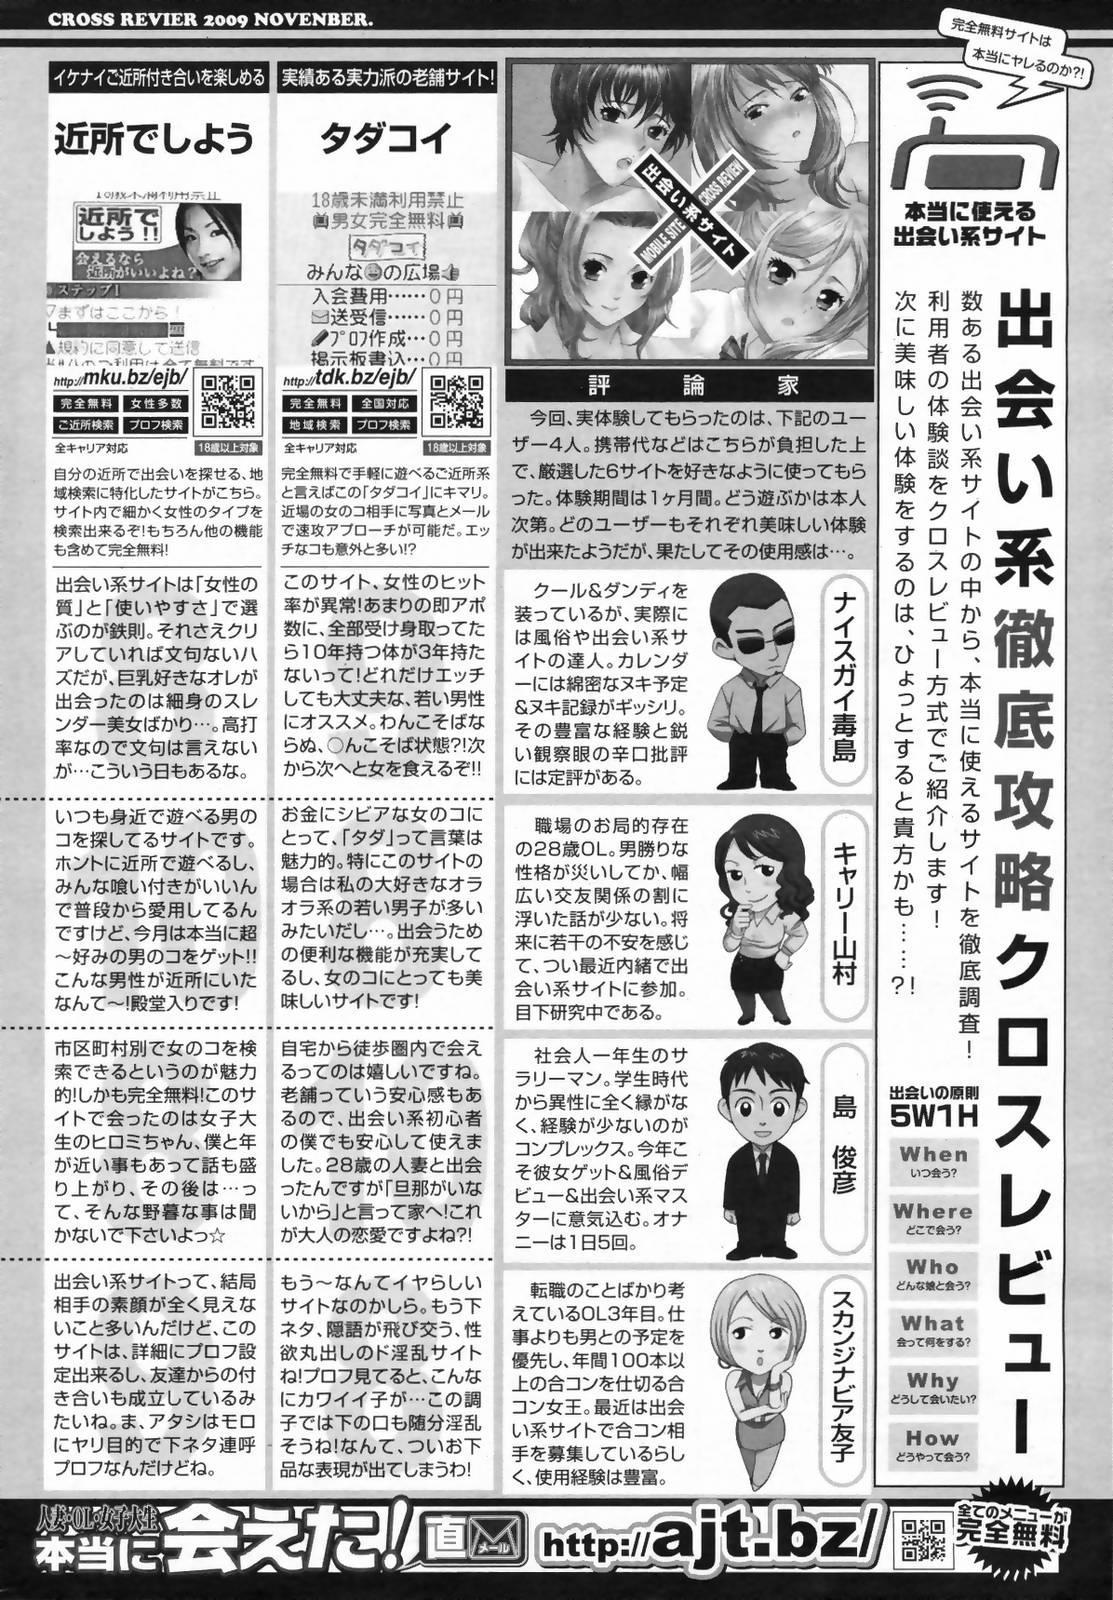 Manga Bangaichi 2009-02 Vol. 234 253